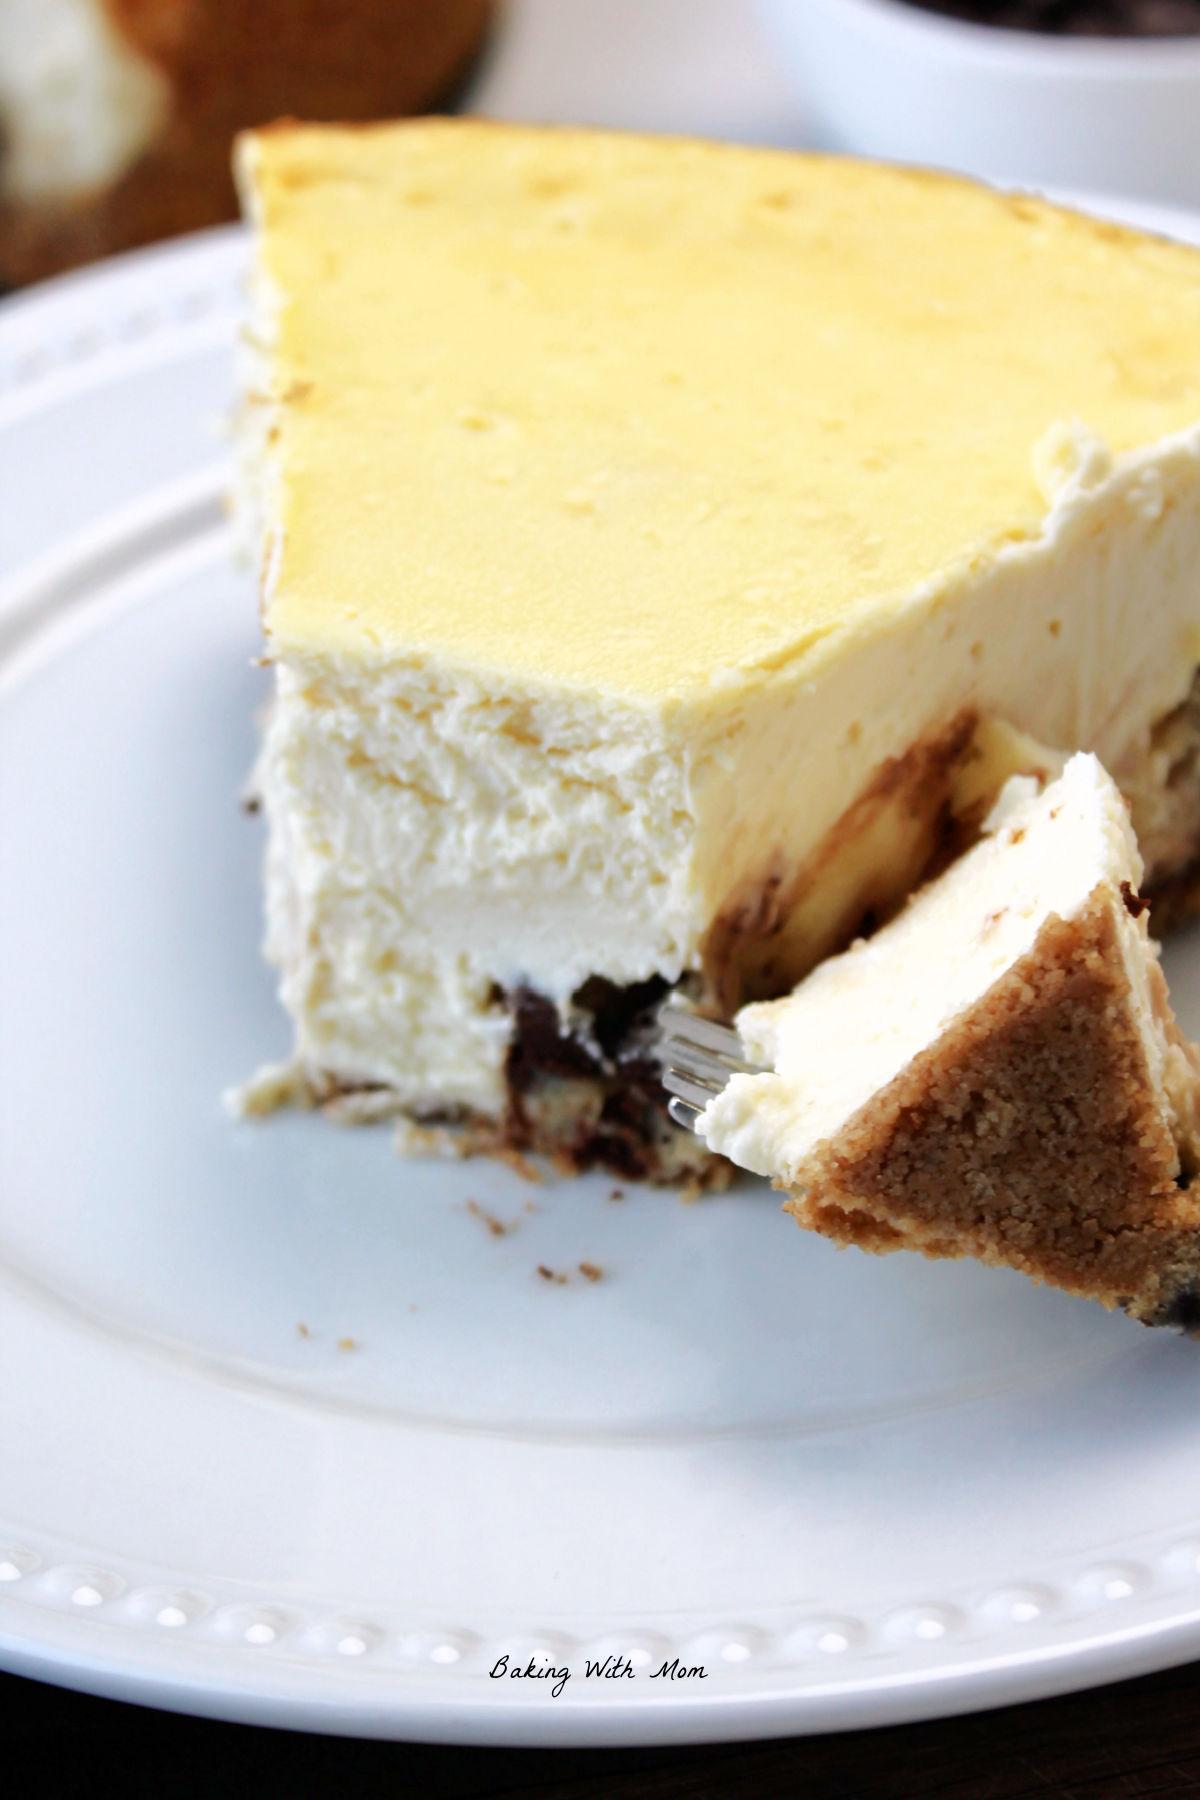 A bite of cheesecake